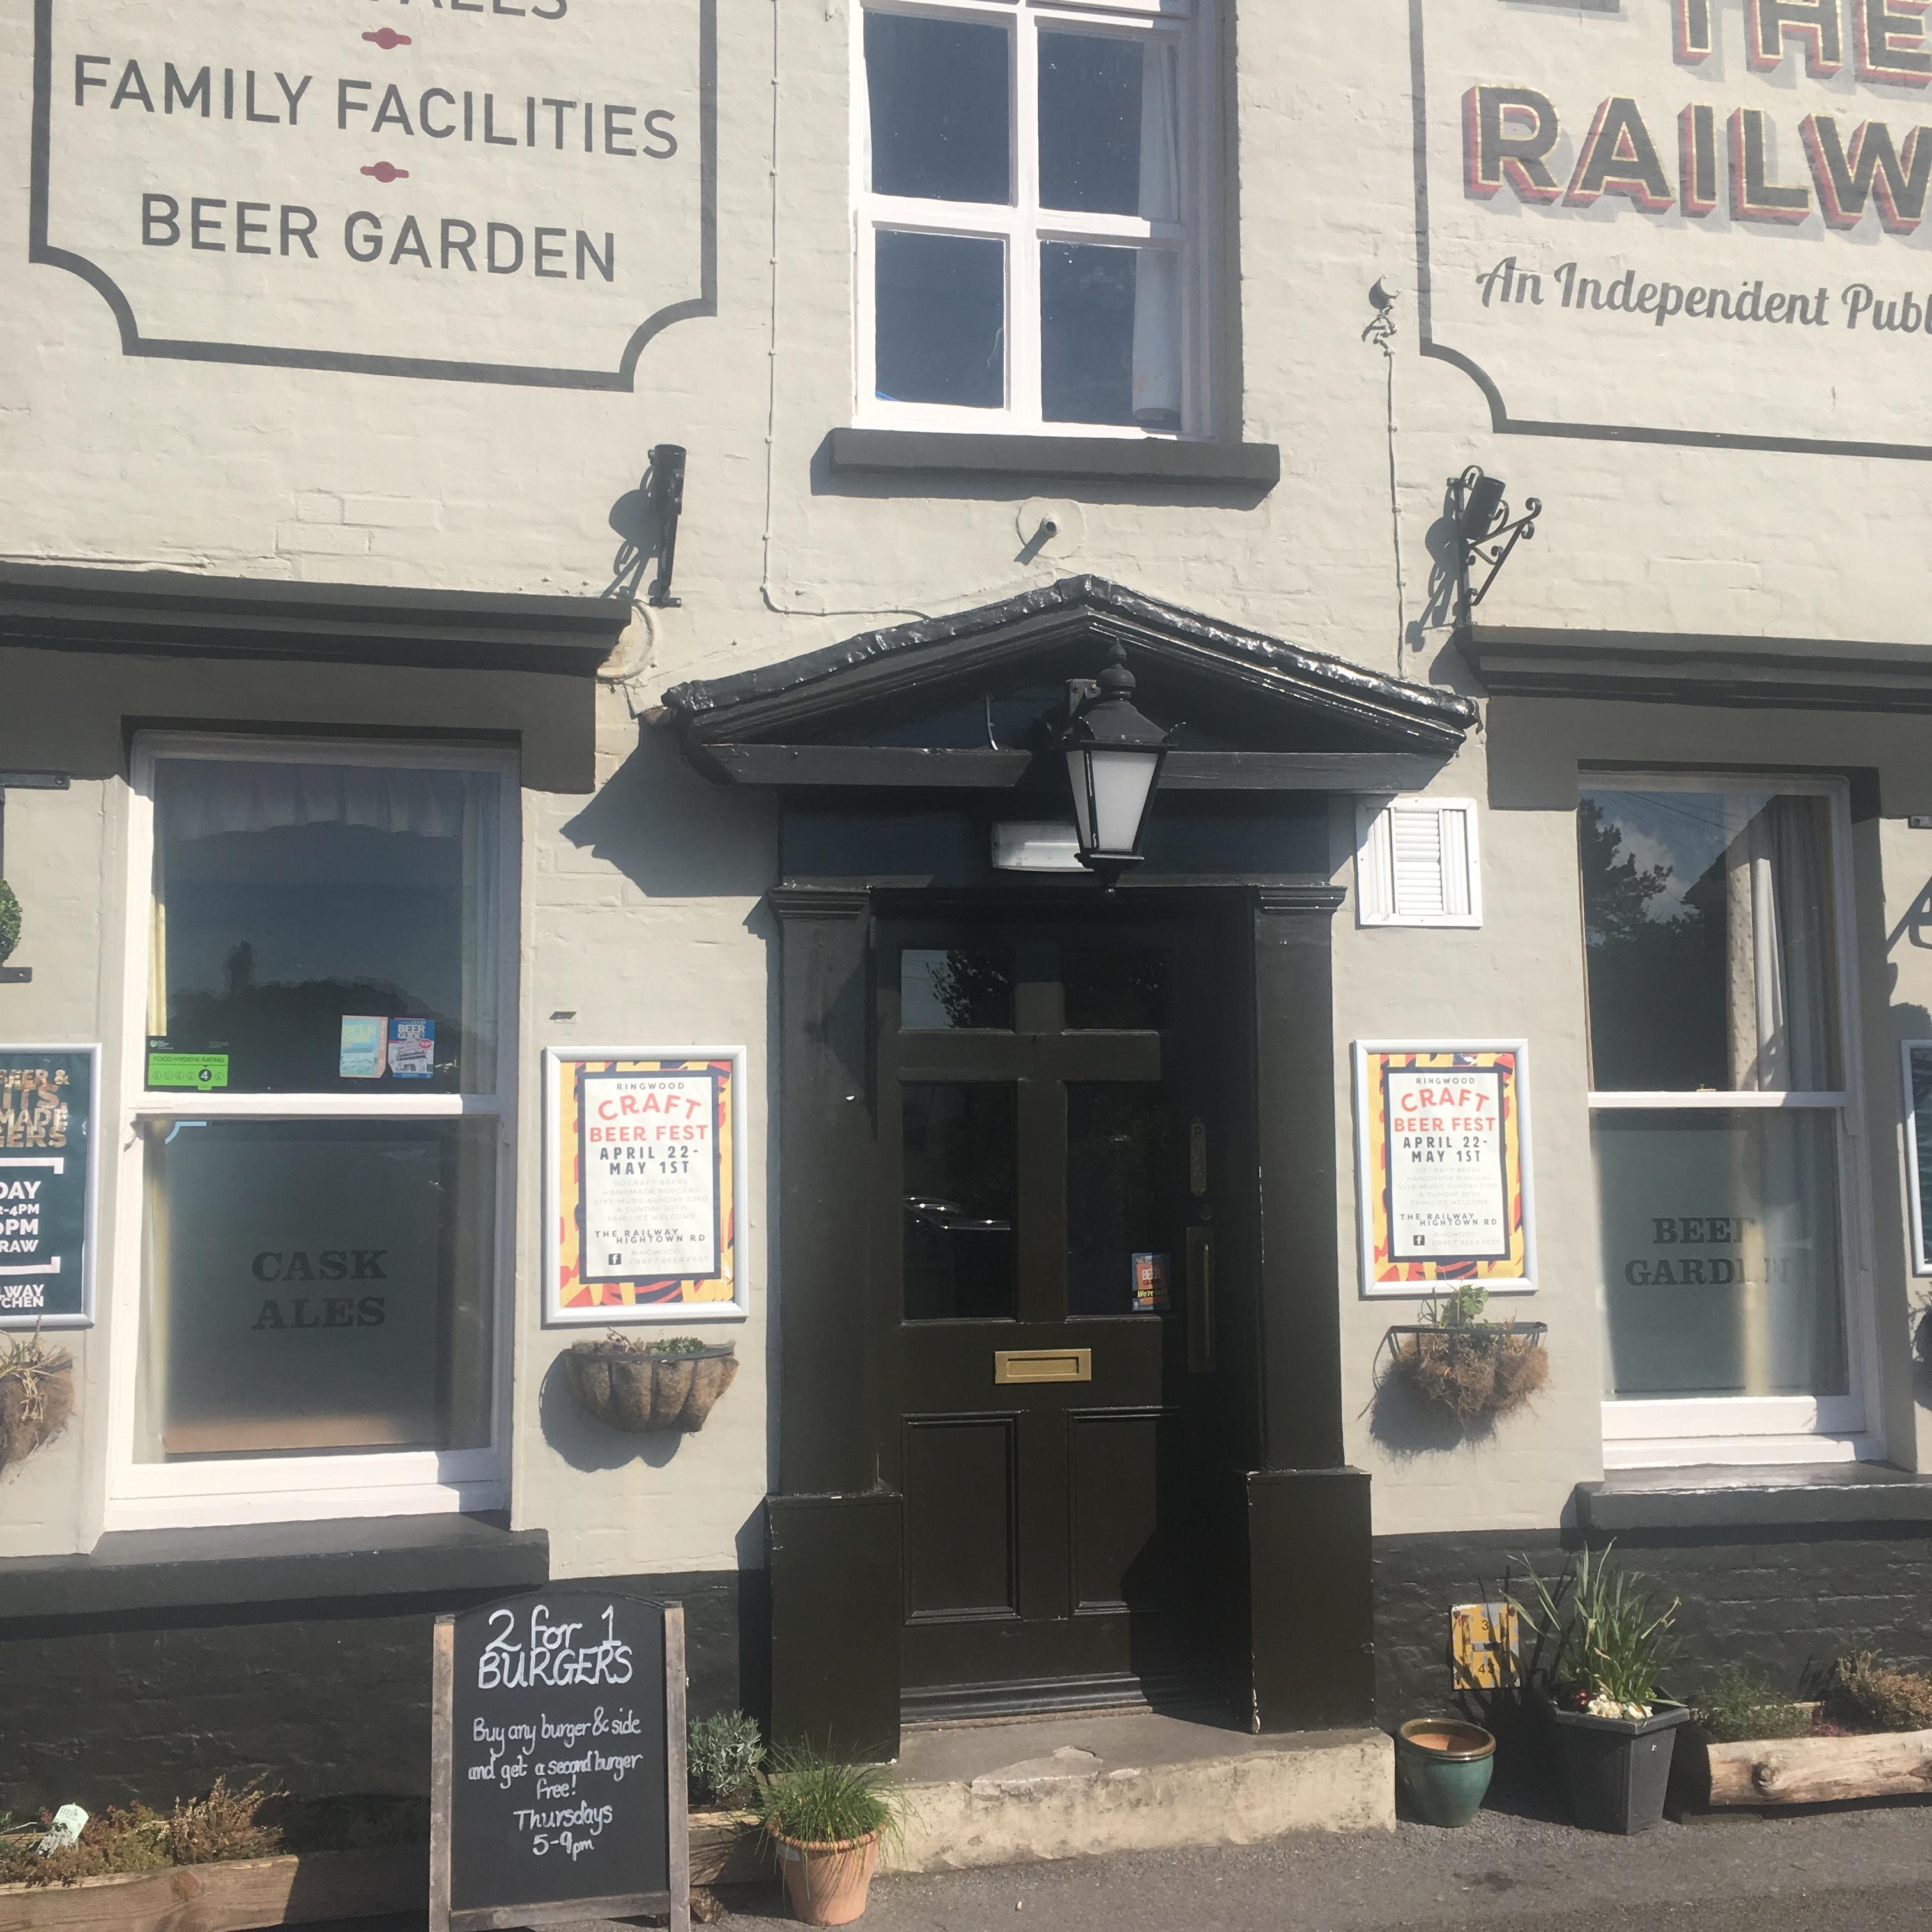 Railway Craft Beer pub and kitchen unspoilt new forest gem